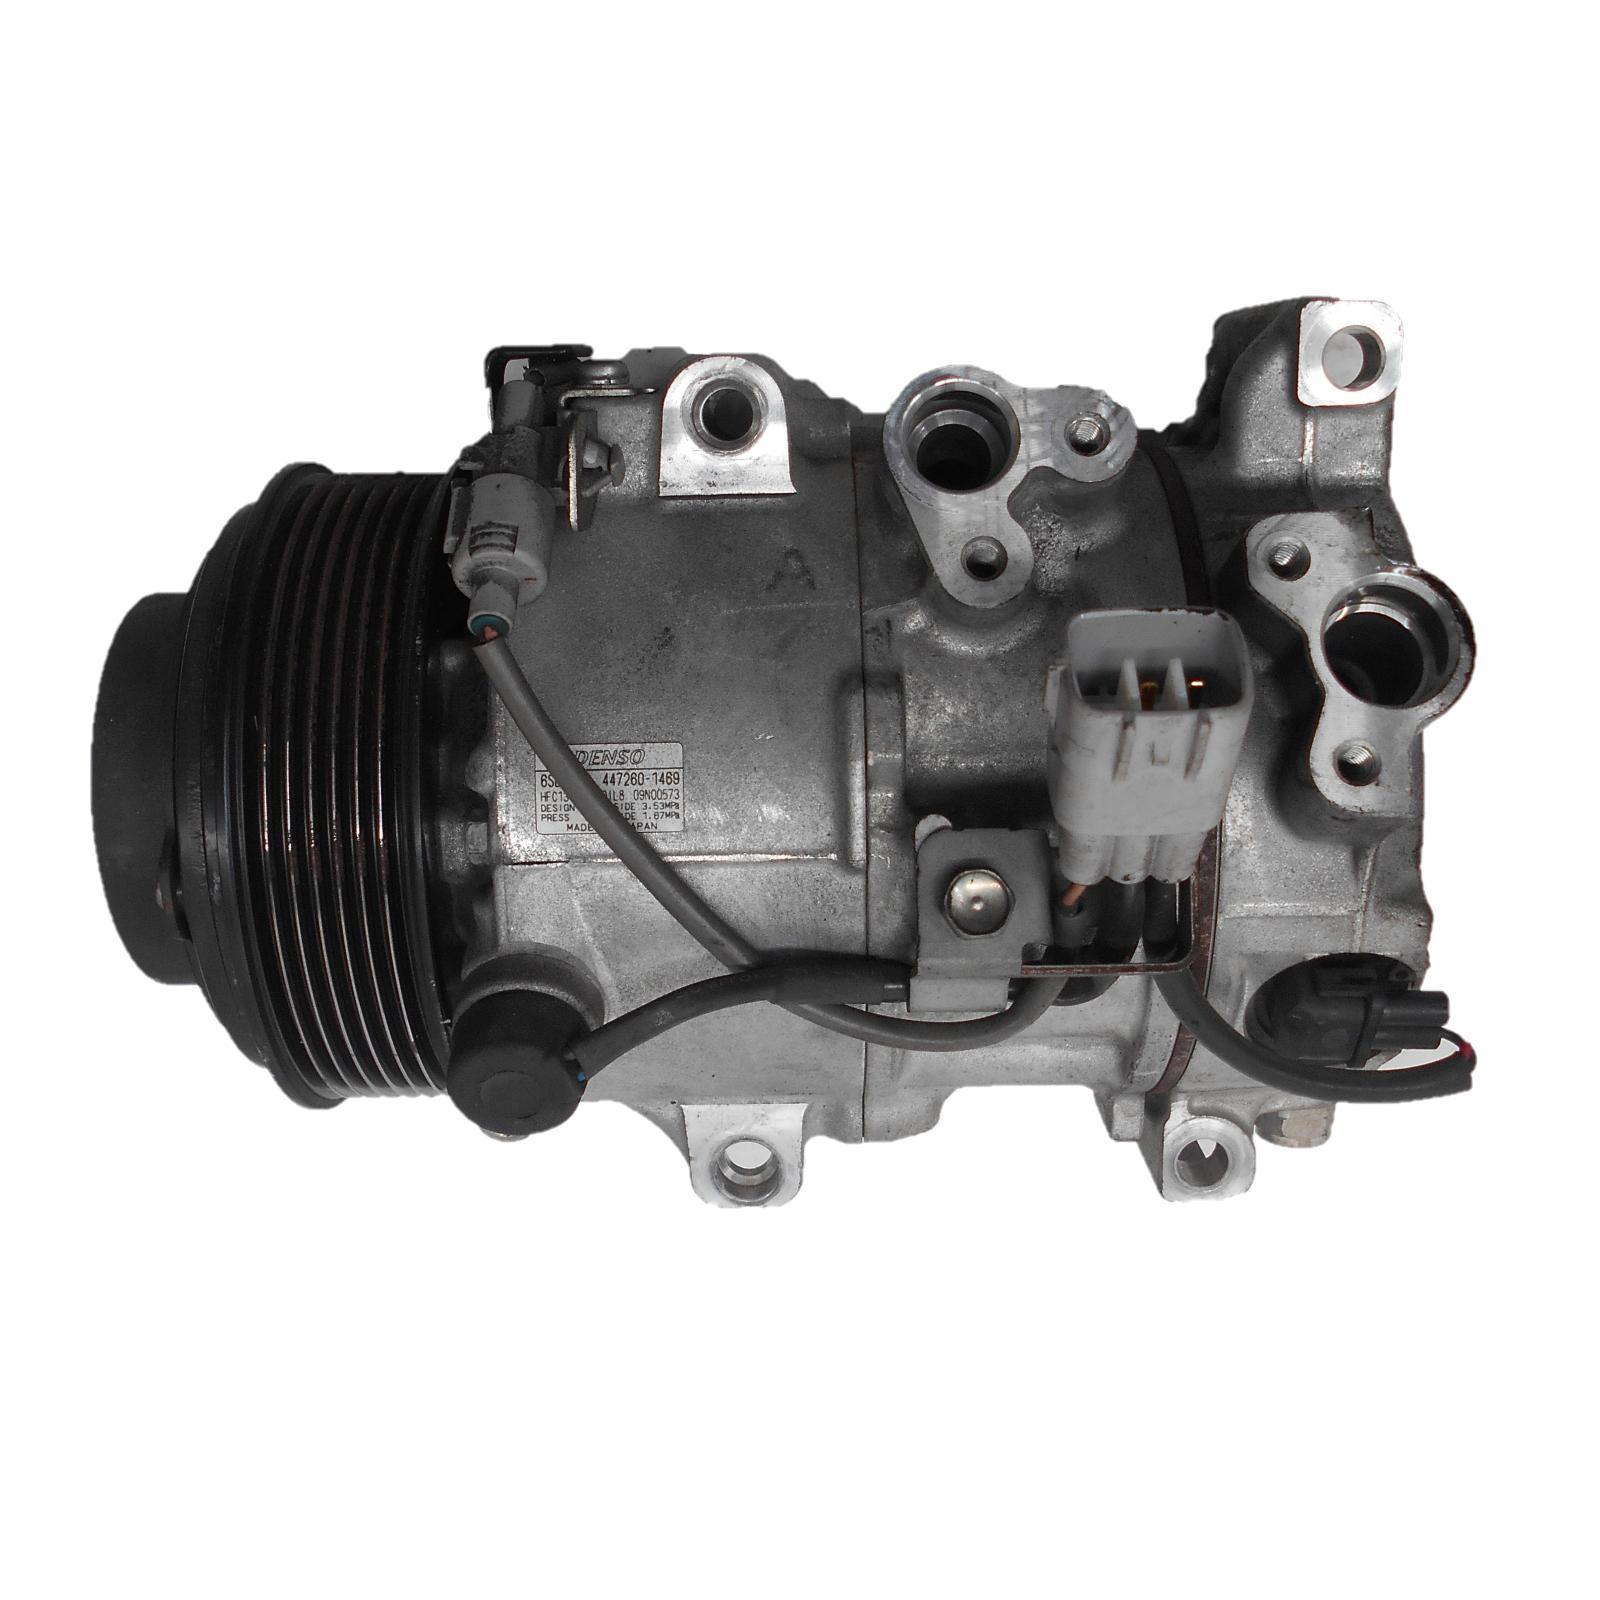 LEXUS IS250/IS250C, A/C Compressor, IS250/IS250C, GSE20R, 2.5, 4GR, 11/05-12/14